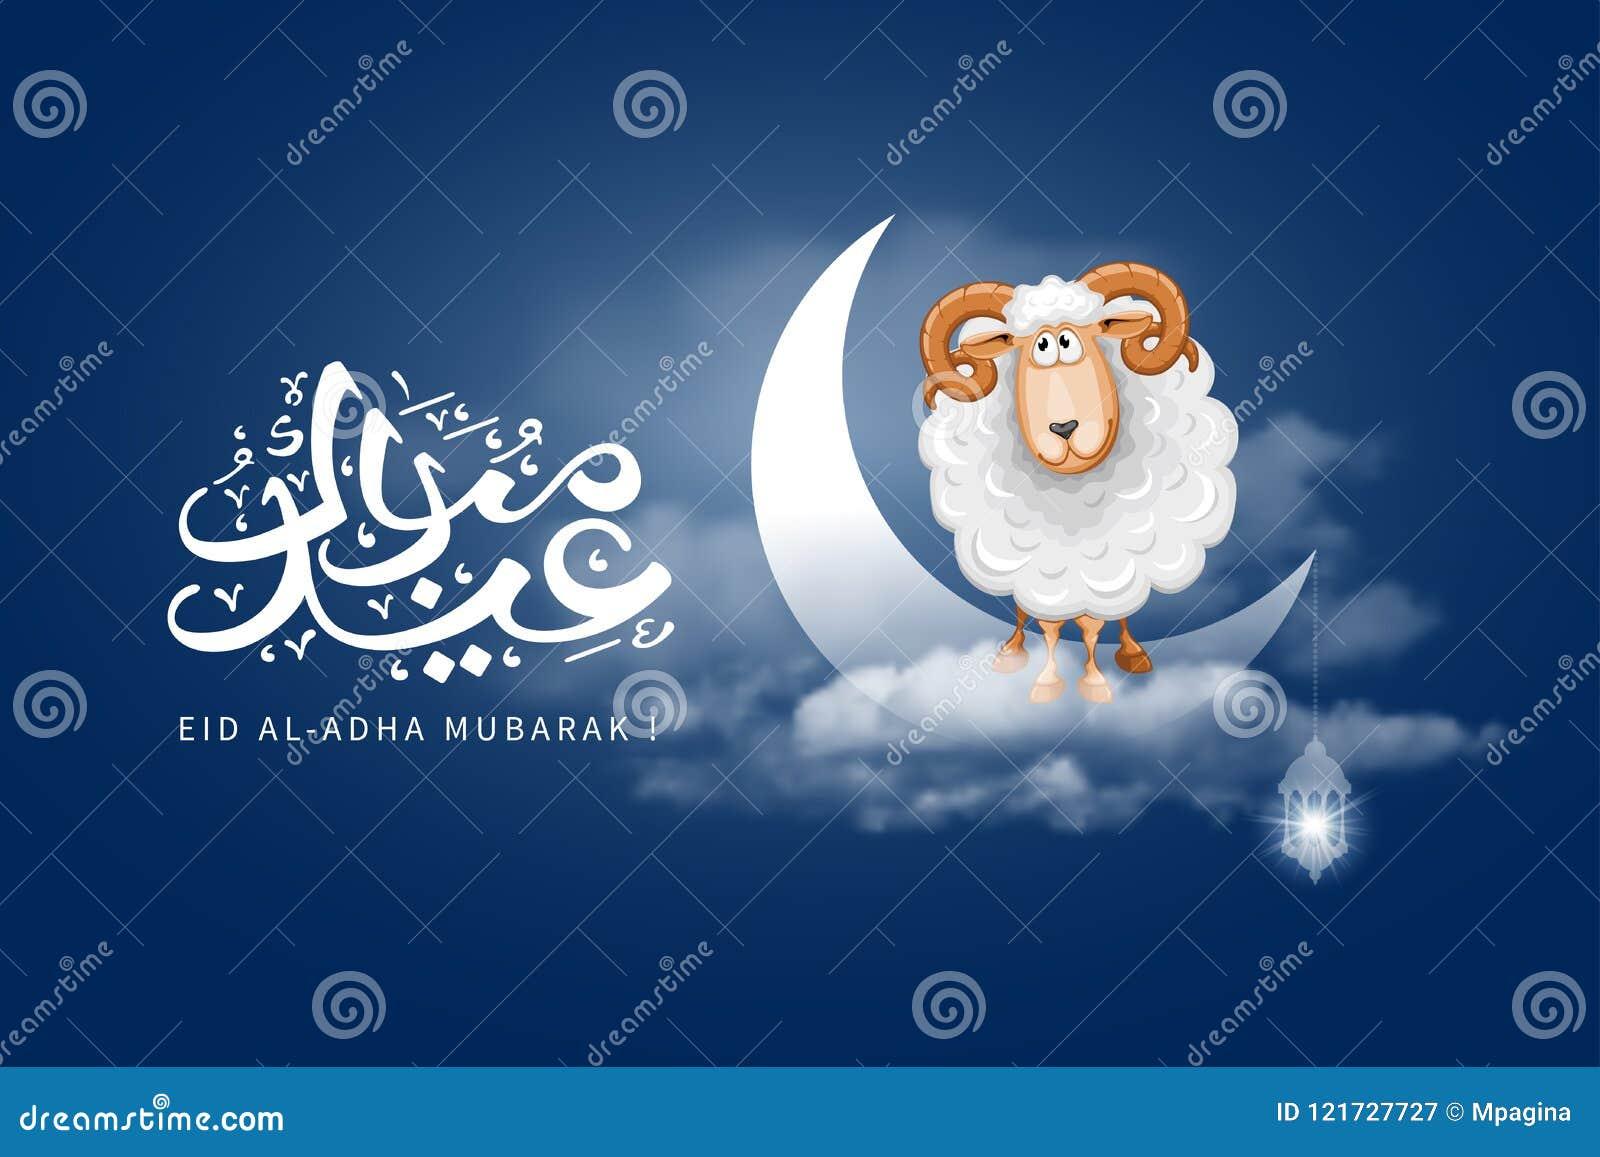 Eid Al Adha Mubarak Stock Vector Illustration Of Clouds 121727727